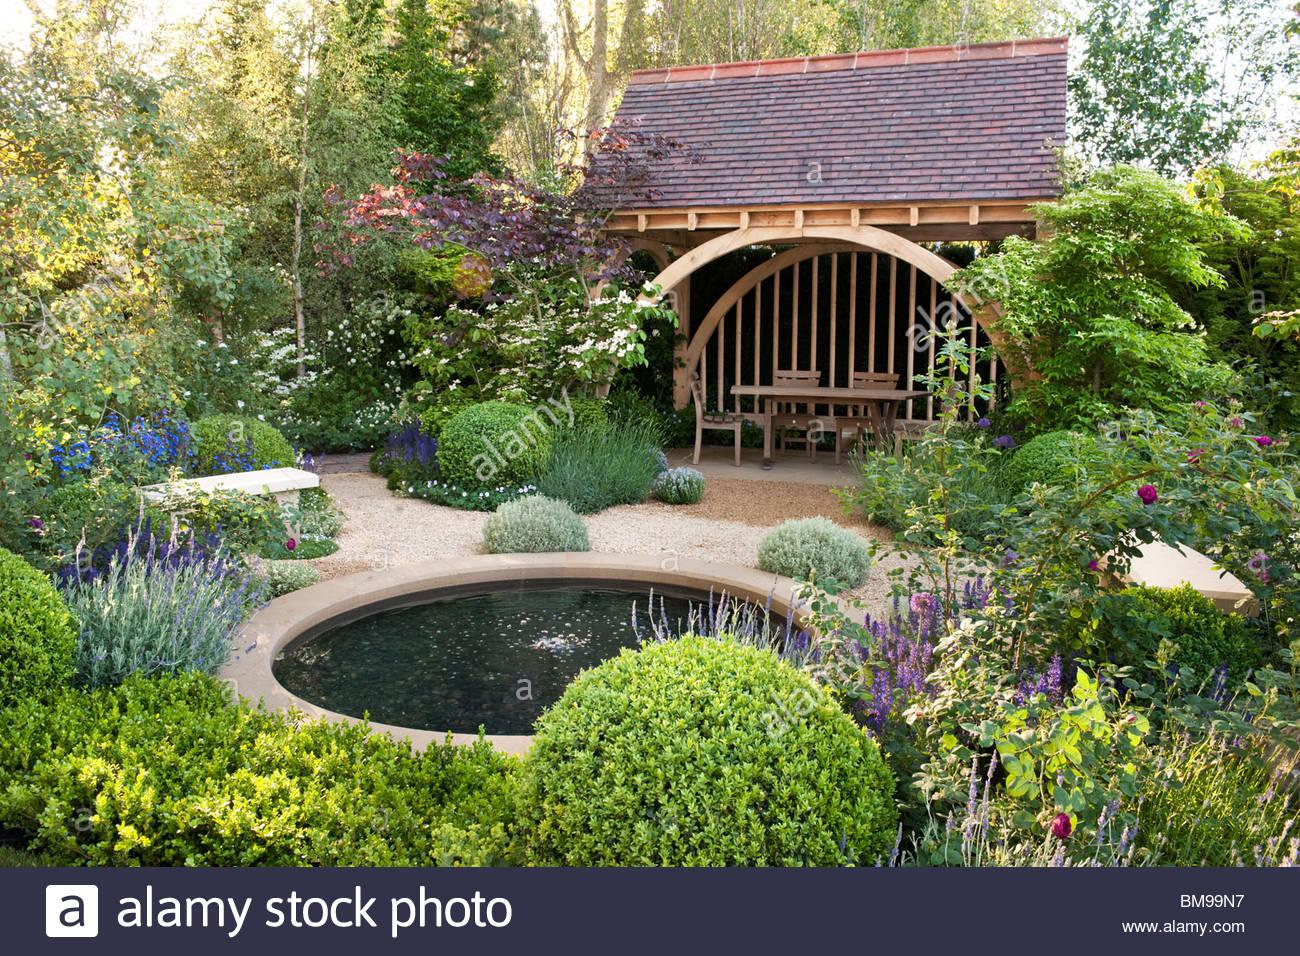 The m g garden designer roger platts gold medal at rhs - Chelsea flower show gold medals ...